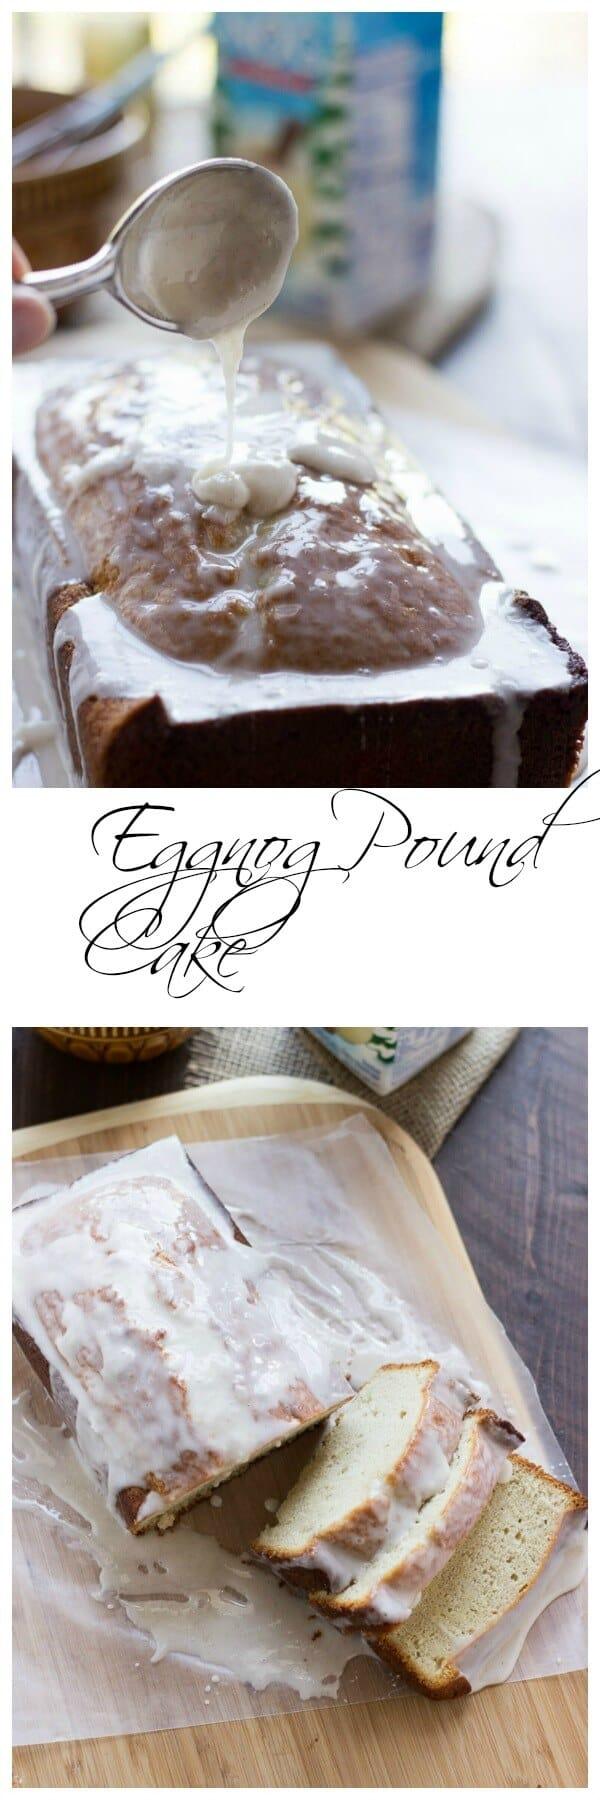 Eggnog pound cake with icing